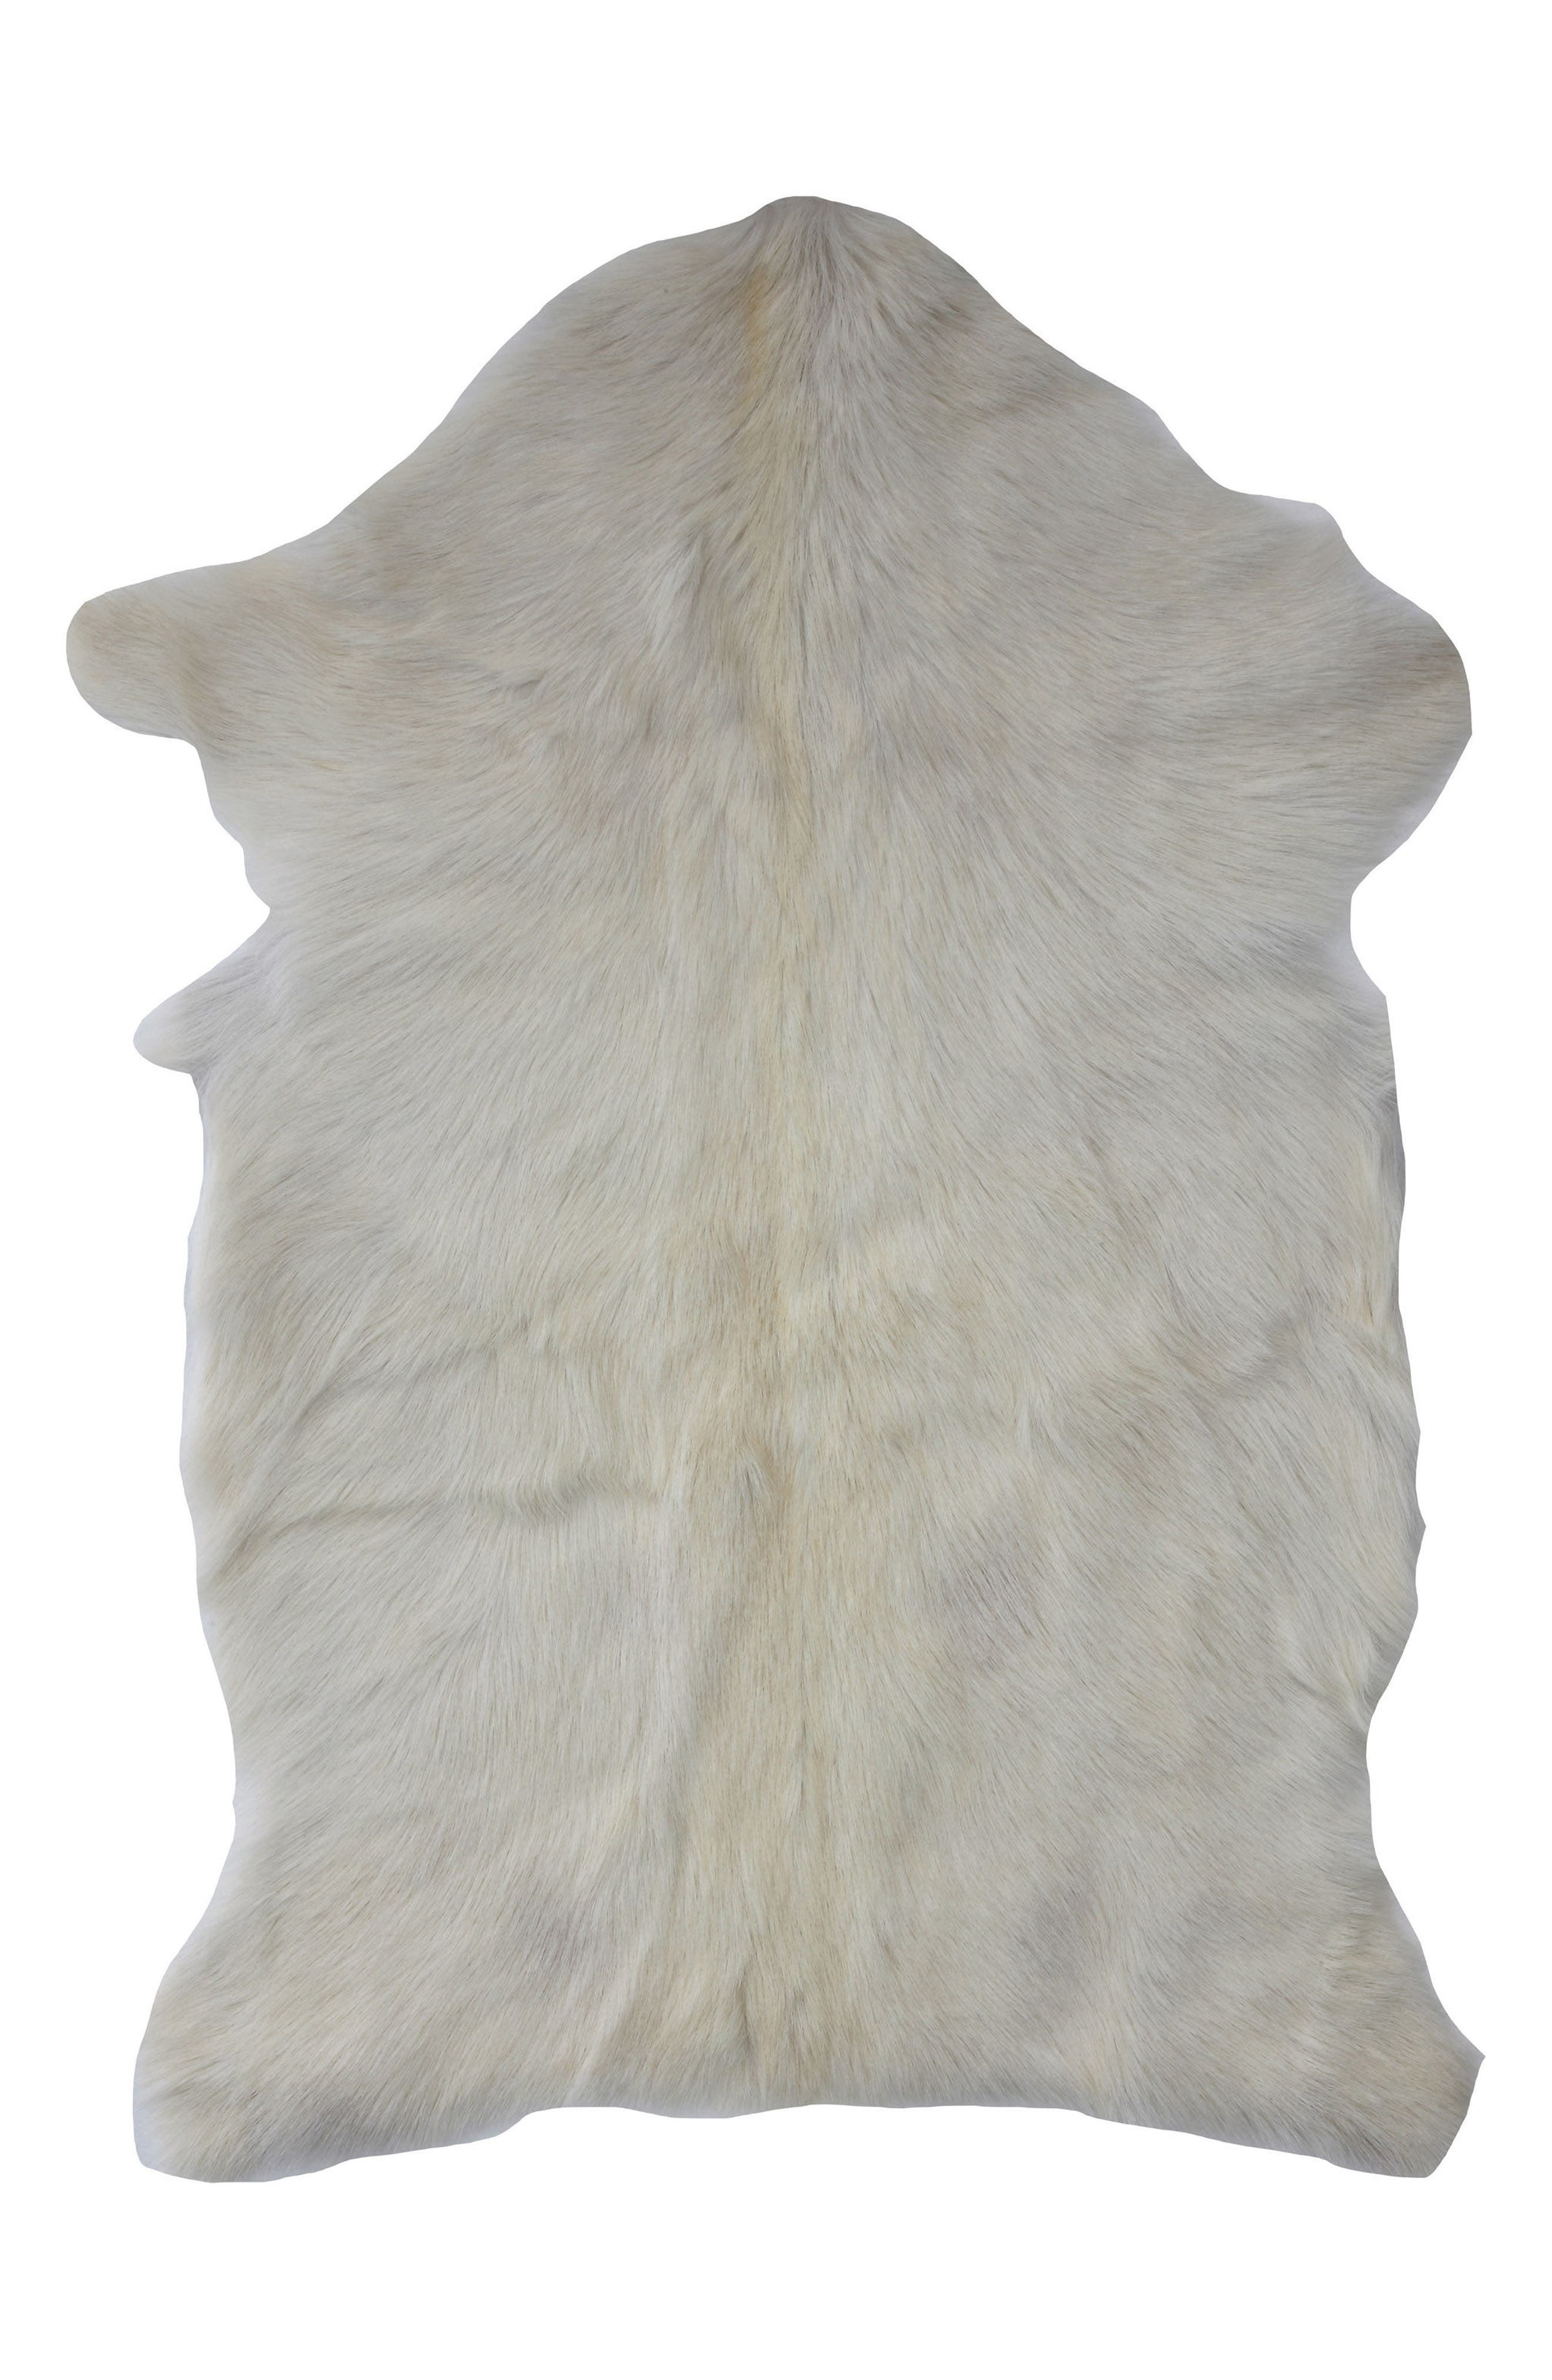 Genuine Goat Hair Rug, Main, color, 100